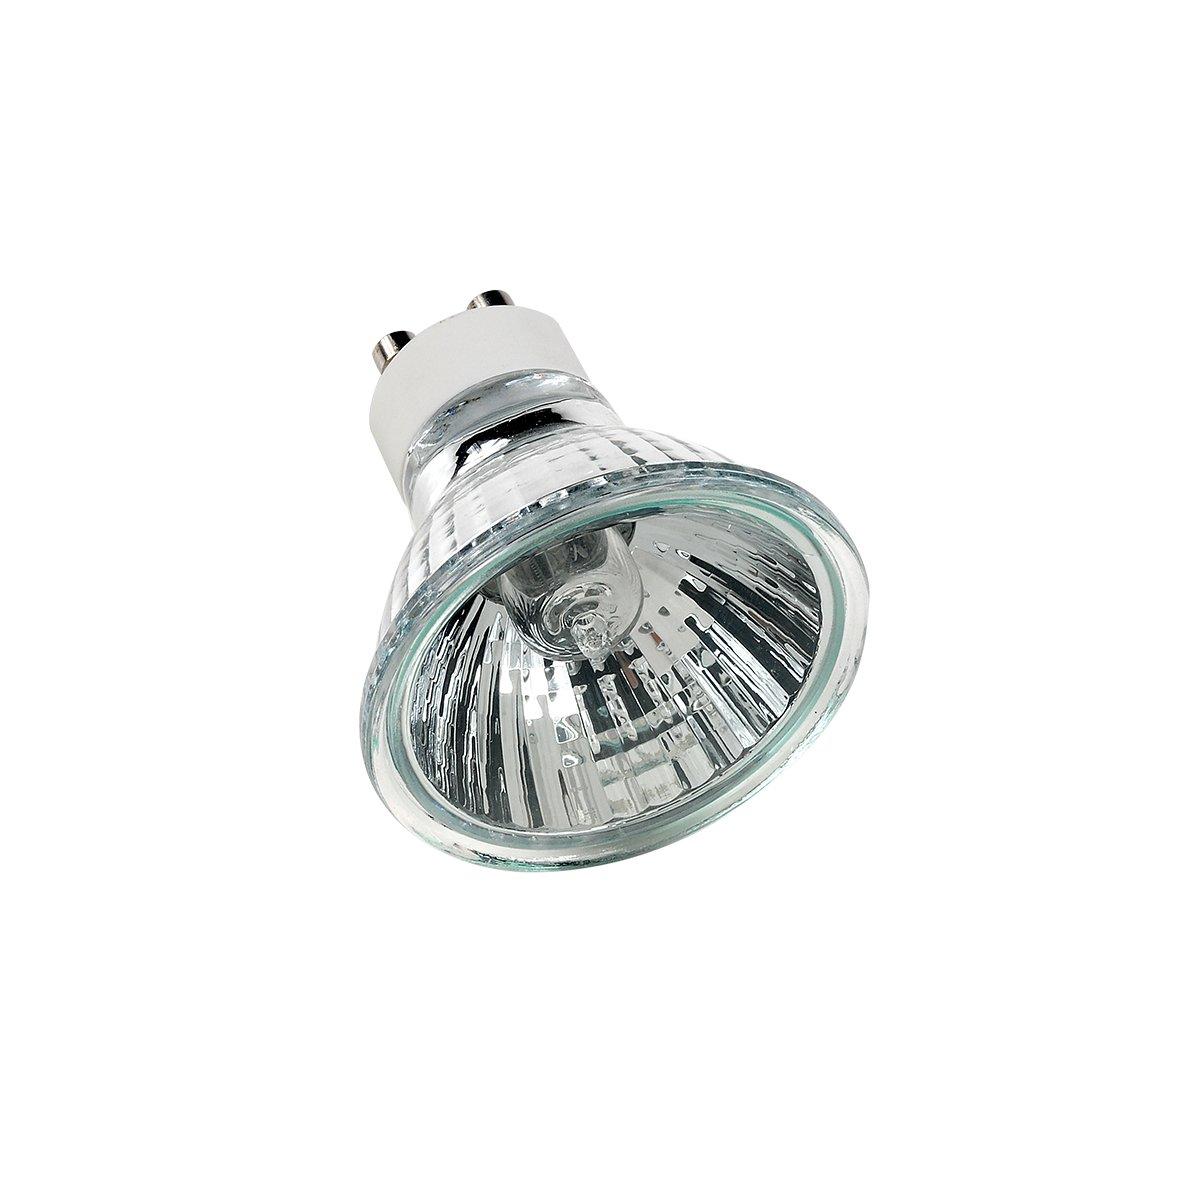 WAC Lighting GU10 EXN 40 Degree Lamp Halogen Gu10 Base 120V 50W